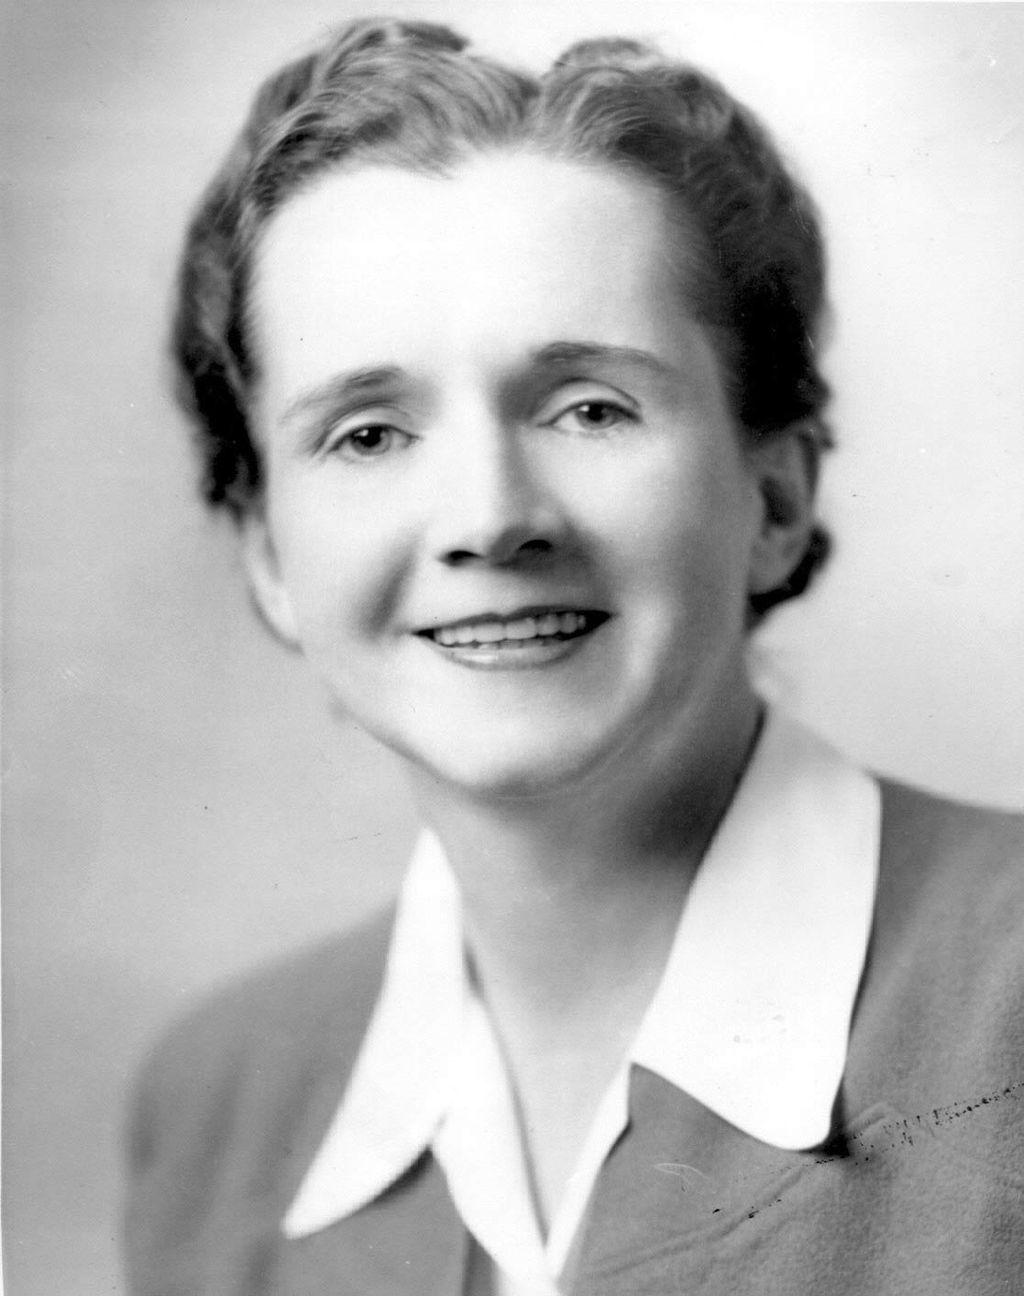 Rachel Carson, 1940 U.S. Fish and Wildlife Service employee photo